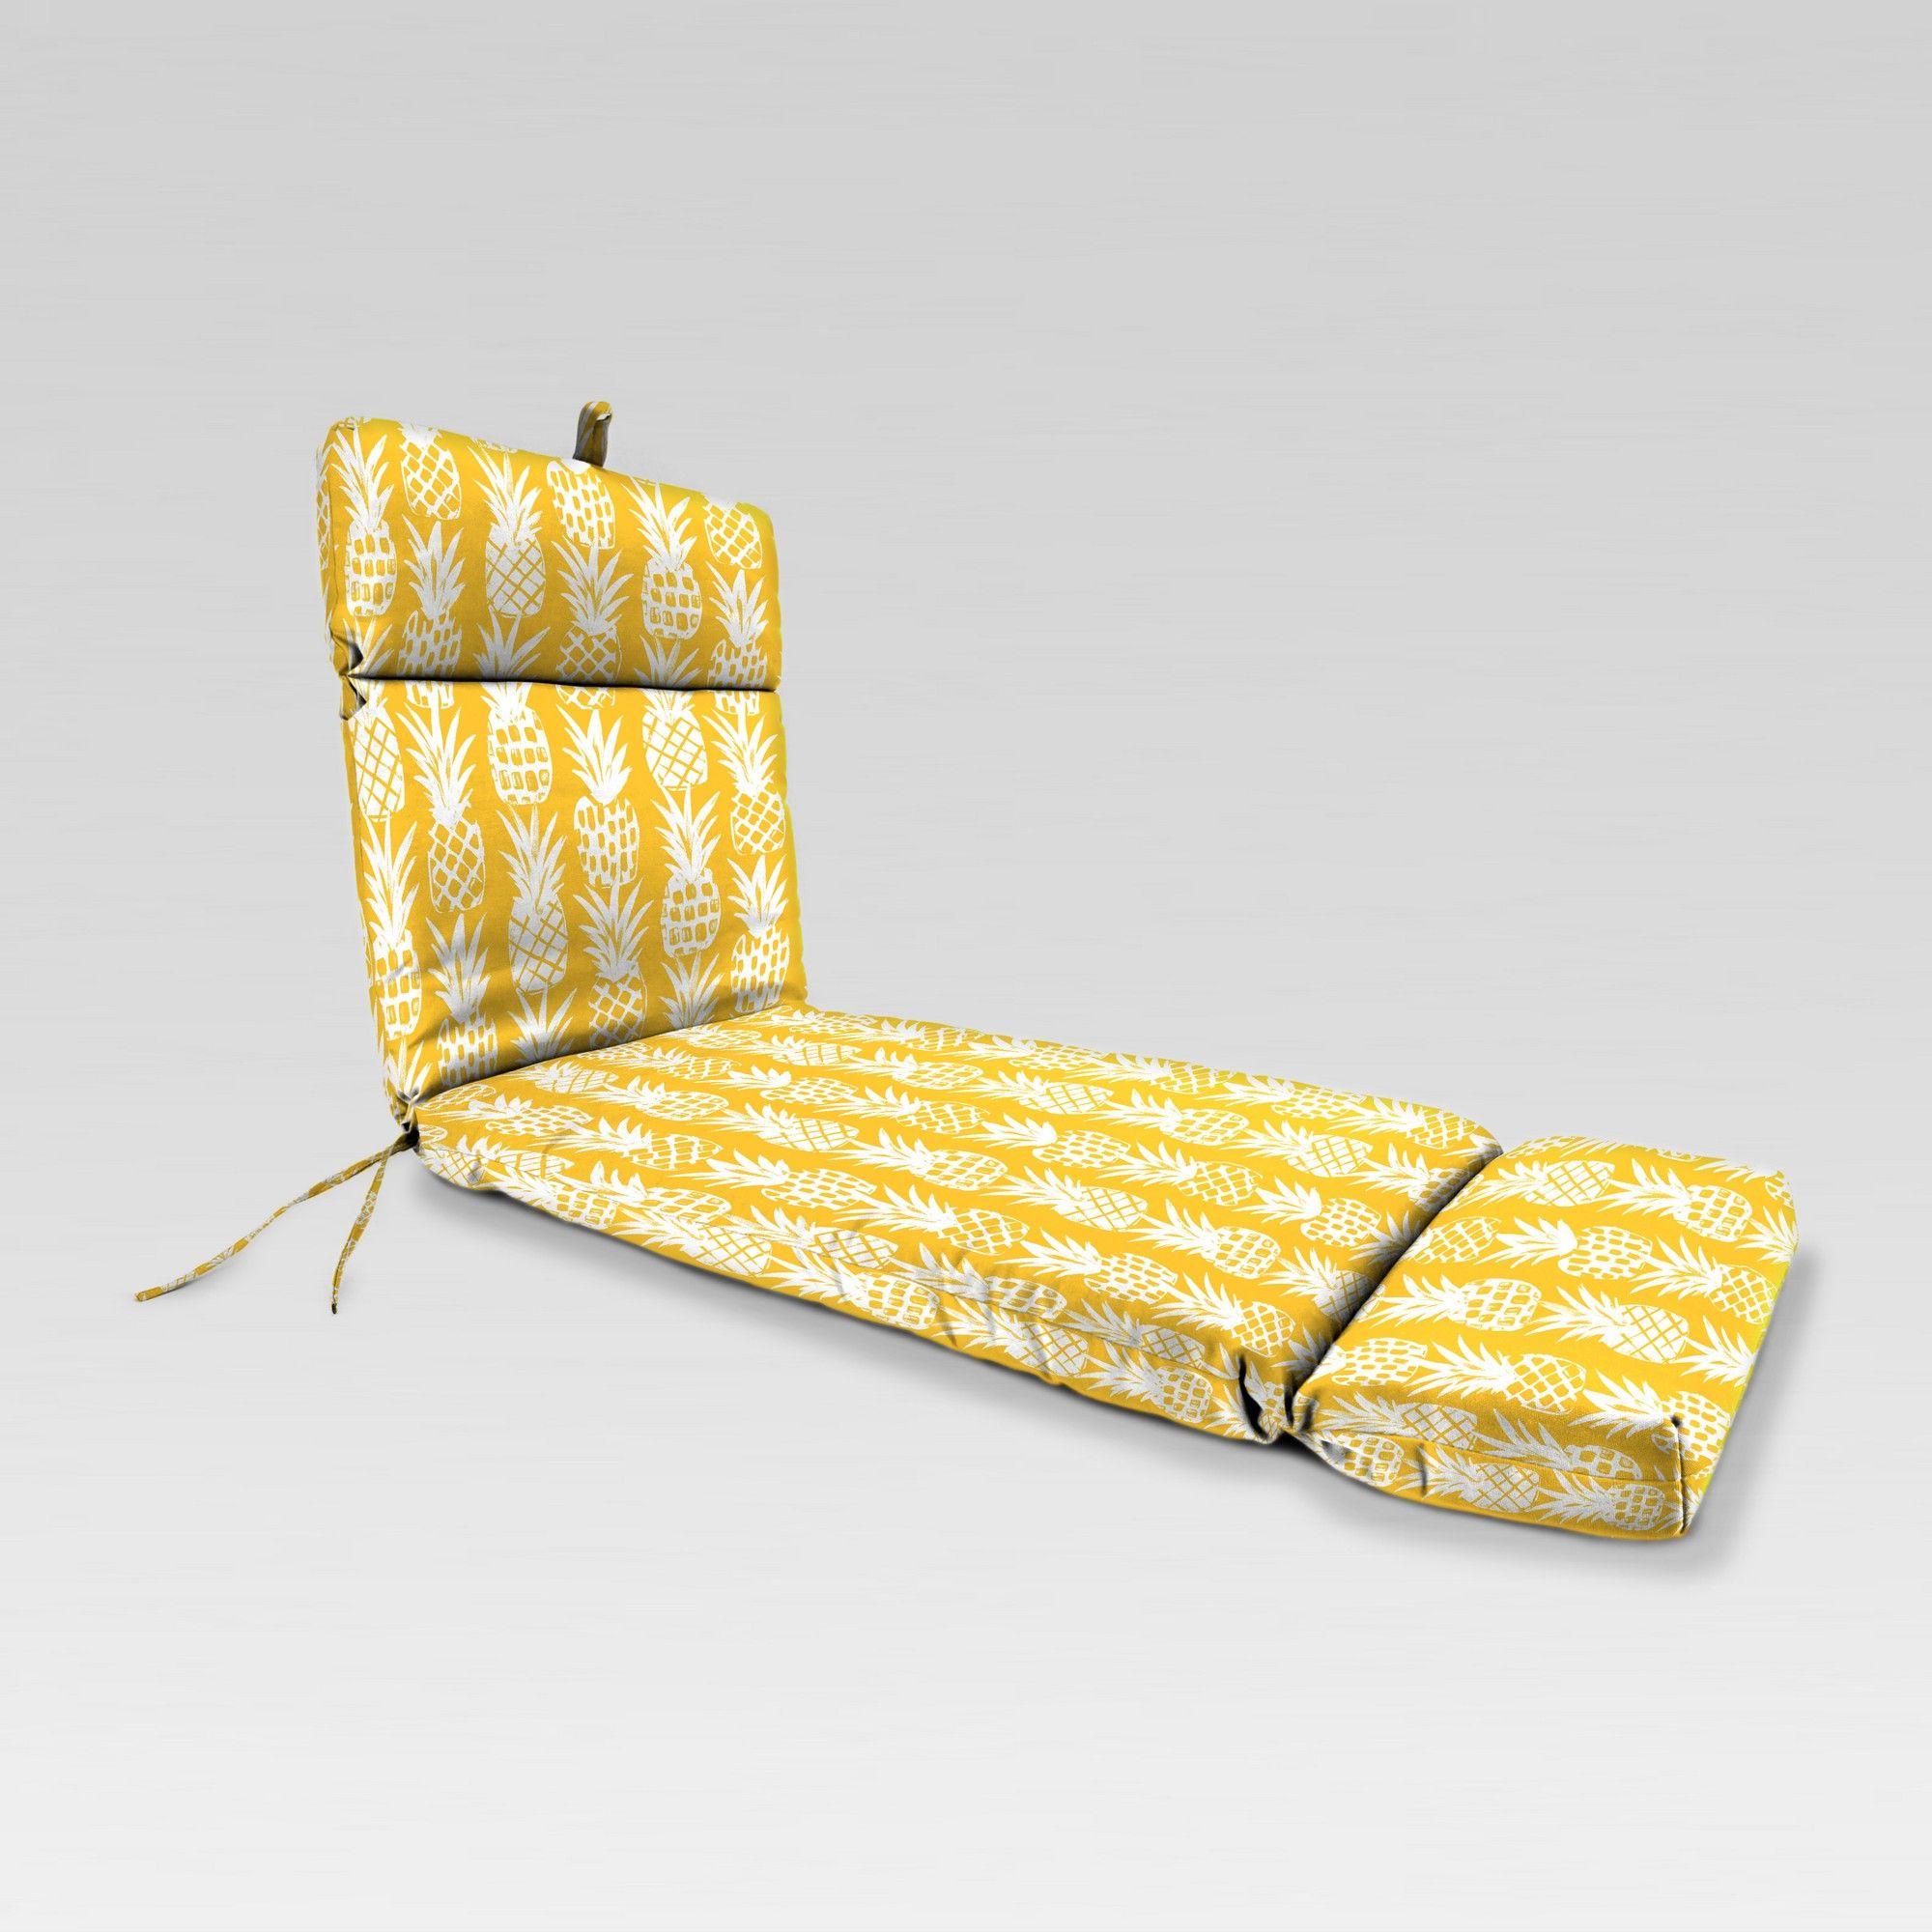 Outdoor French Edge Chaise Lounge Cushion Yellow Pinele Jordan Manufacturing